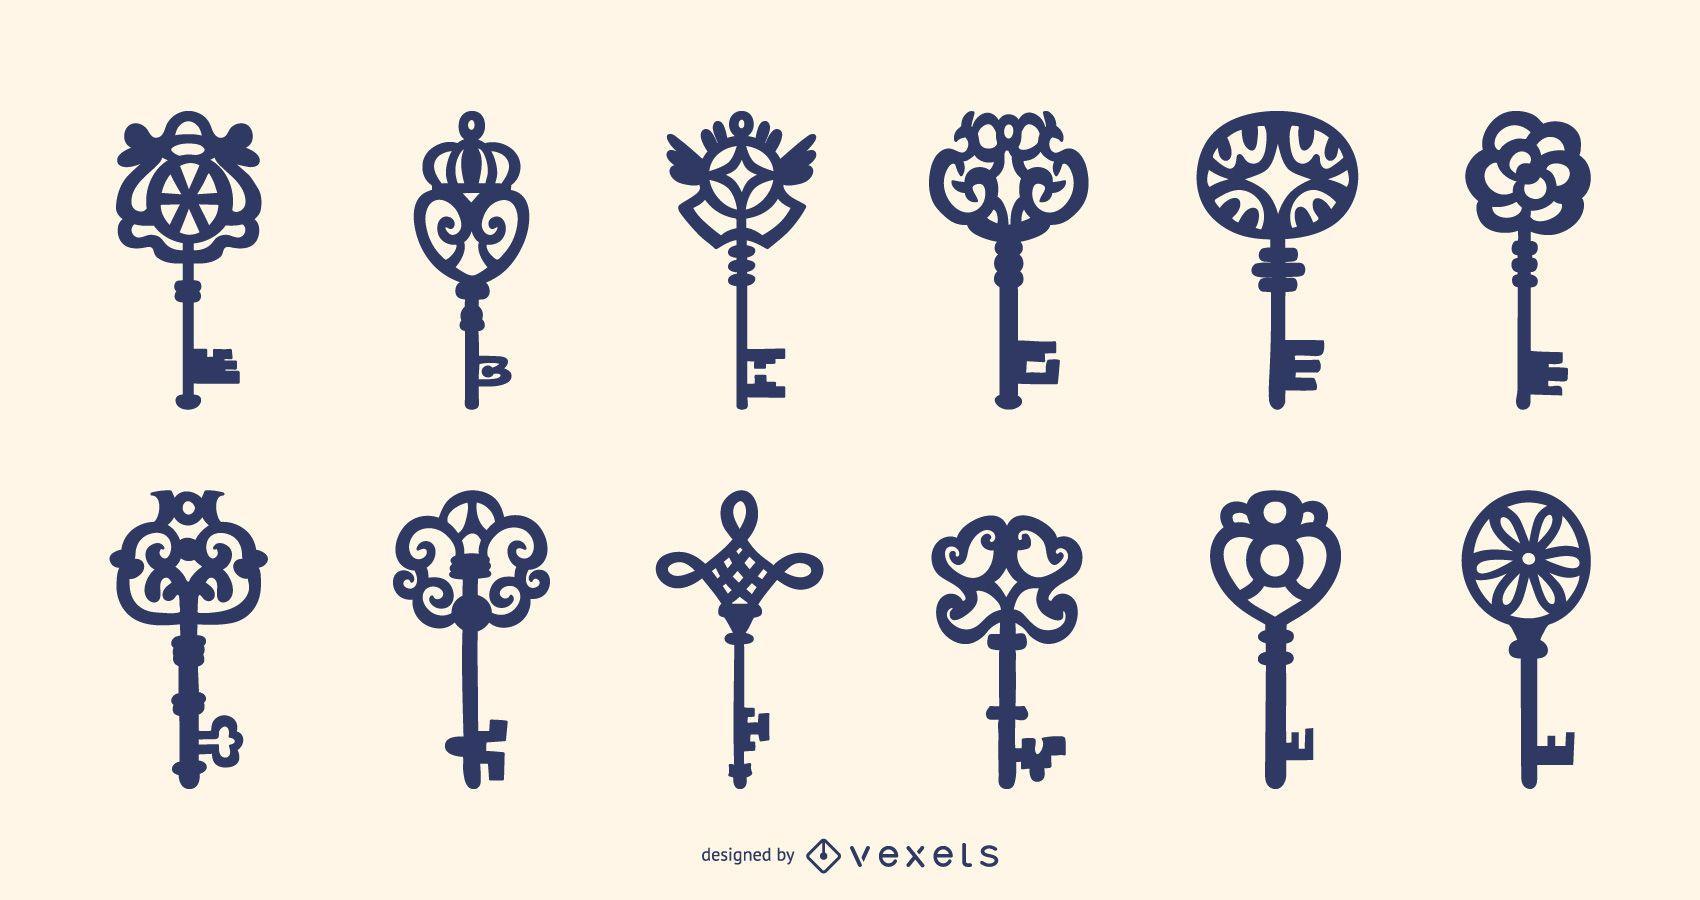 Ornamental keys collection